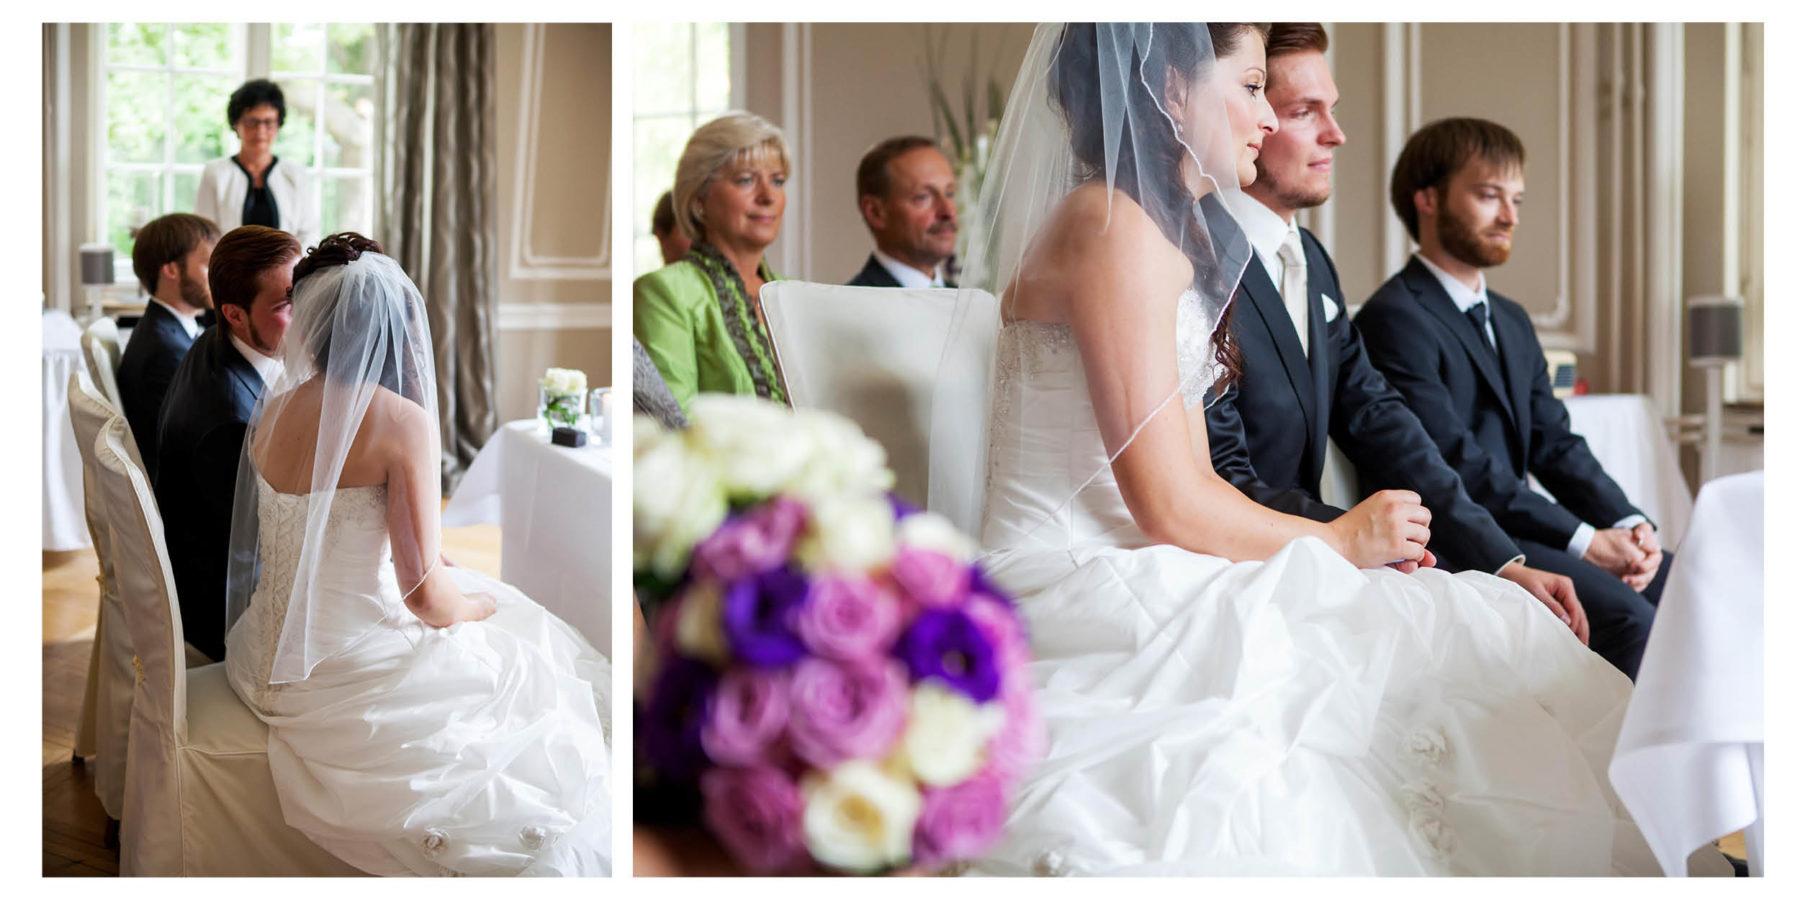 Hochzeit Pösnek 11